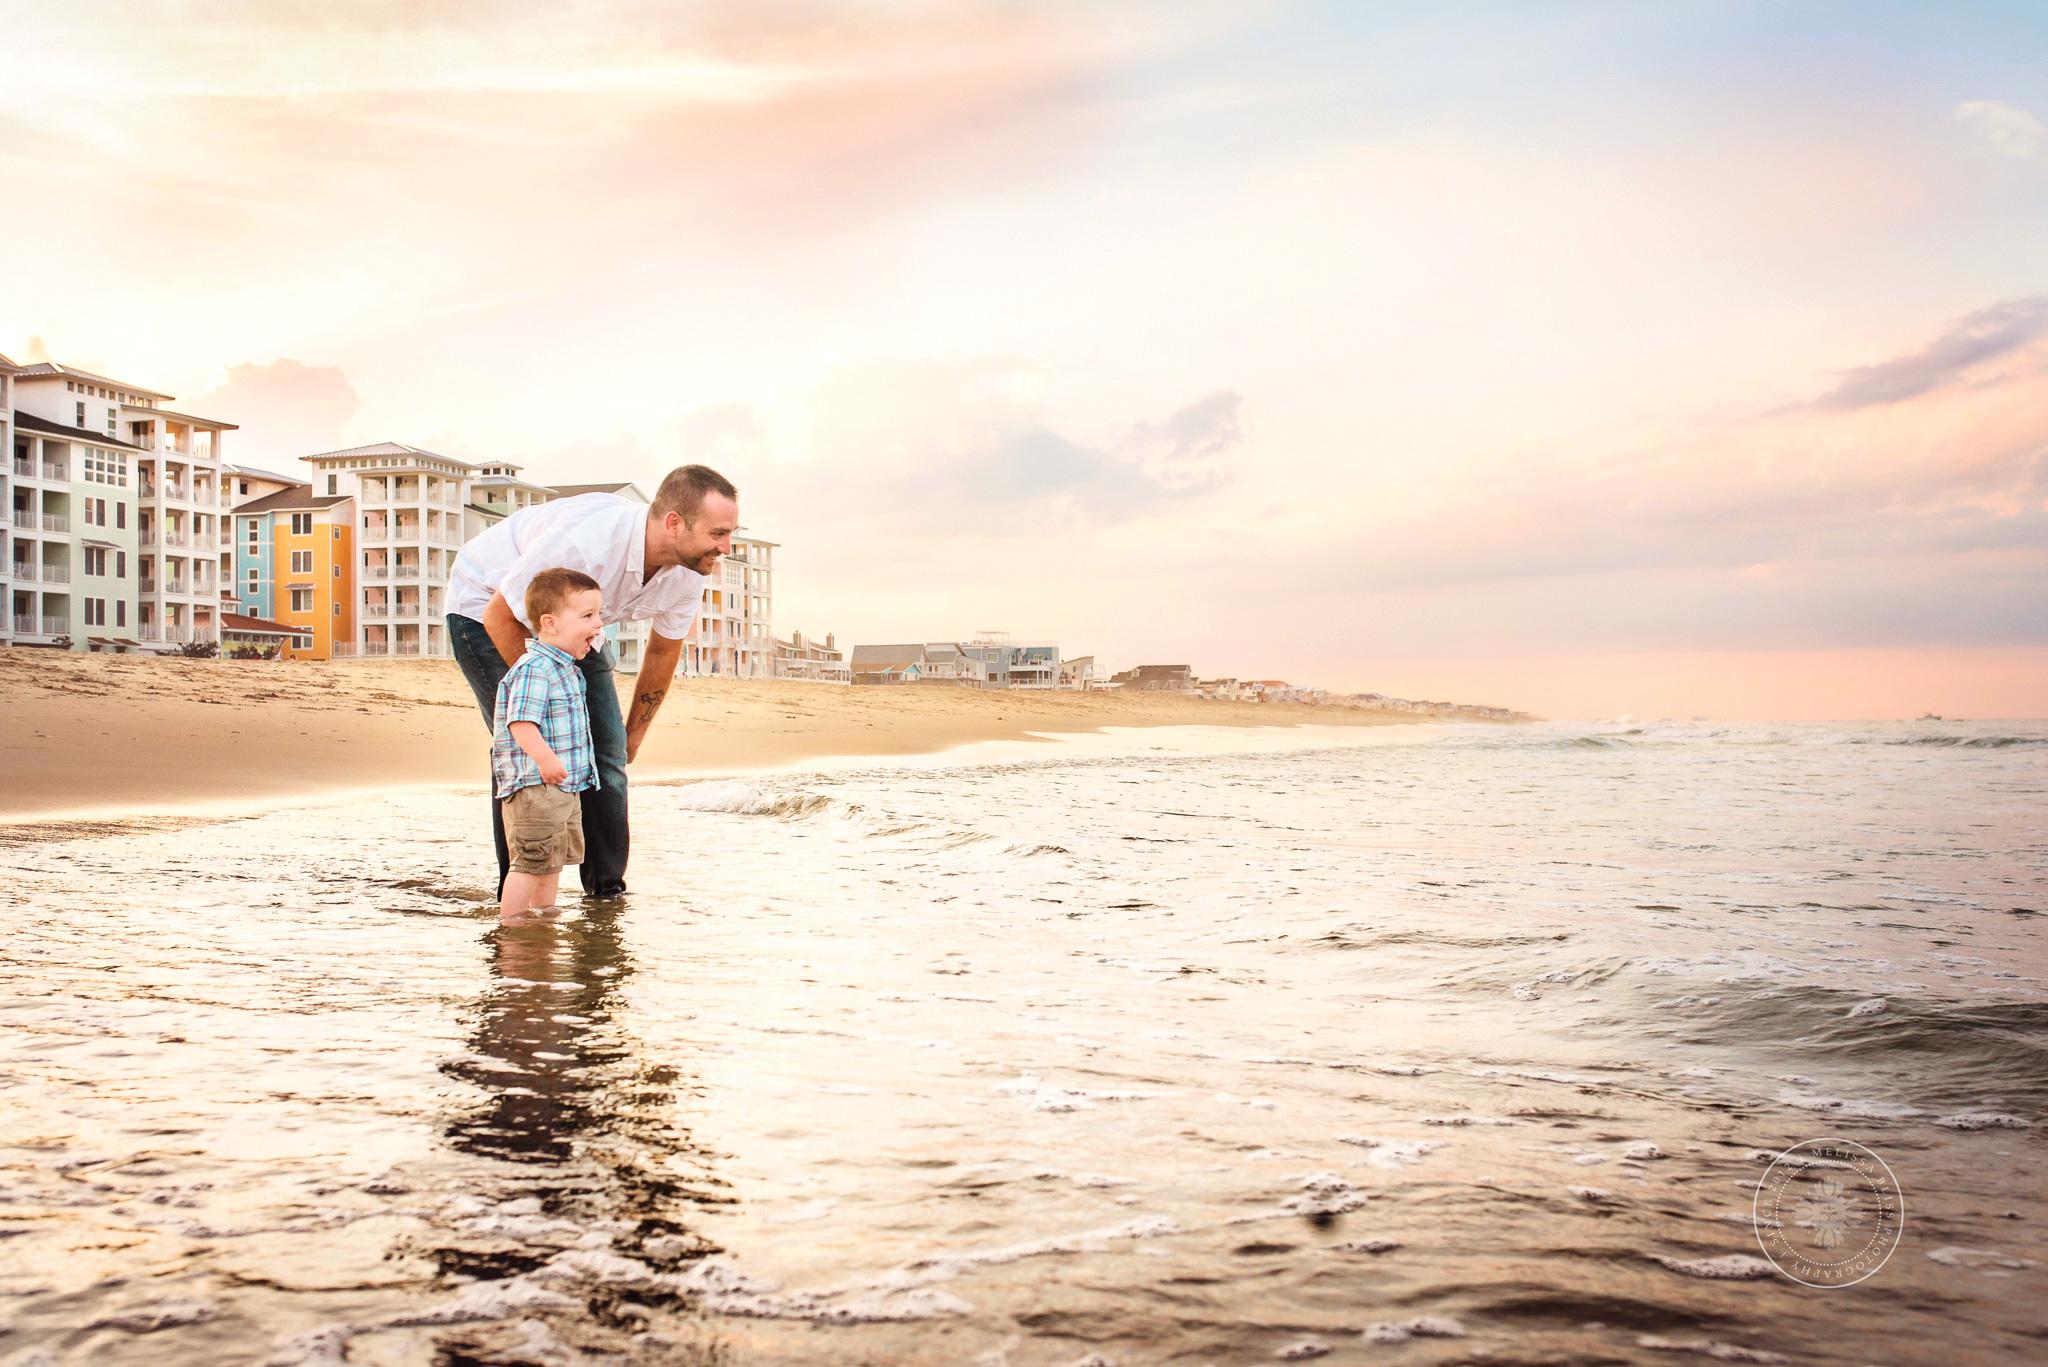 sandbridge-beach-family-photographersC.jpg